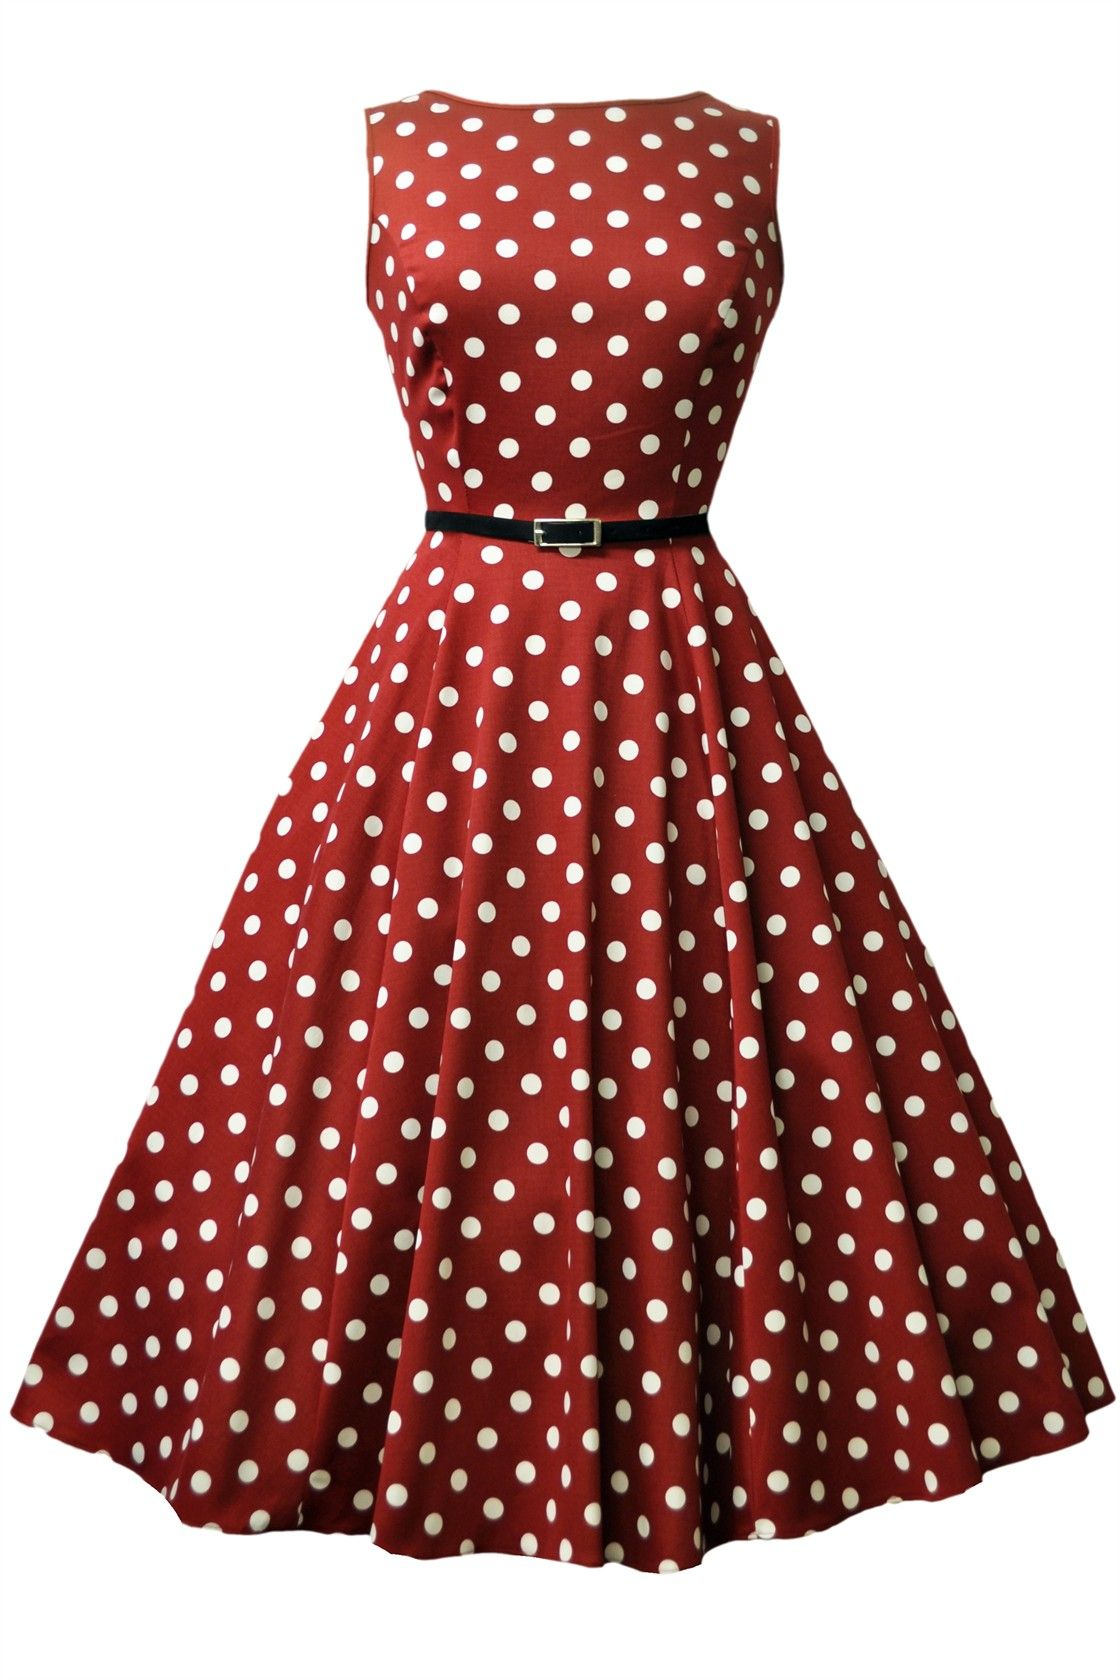 Wine Red Polka Dot Hepburn Dress 45 Made In London Sizes 8 28 Vestidos Para Ninas Vestidos De Dia Ropa